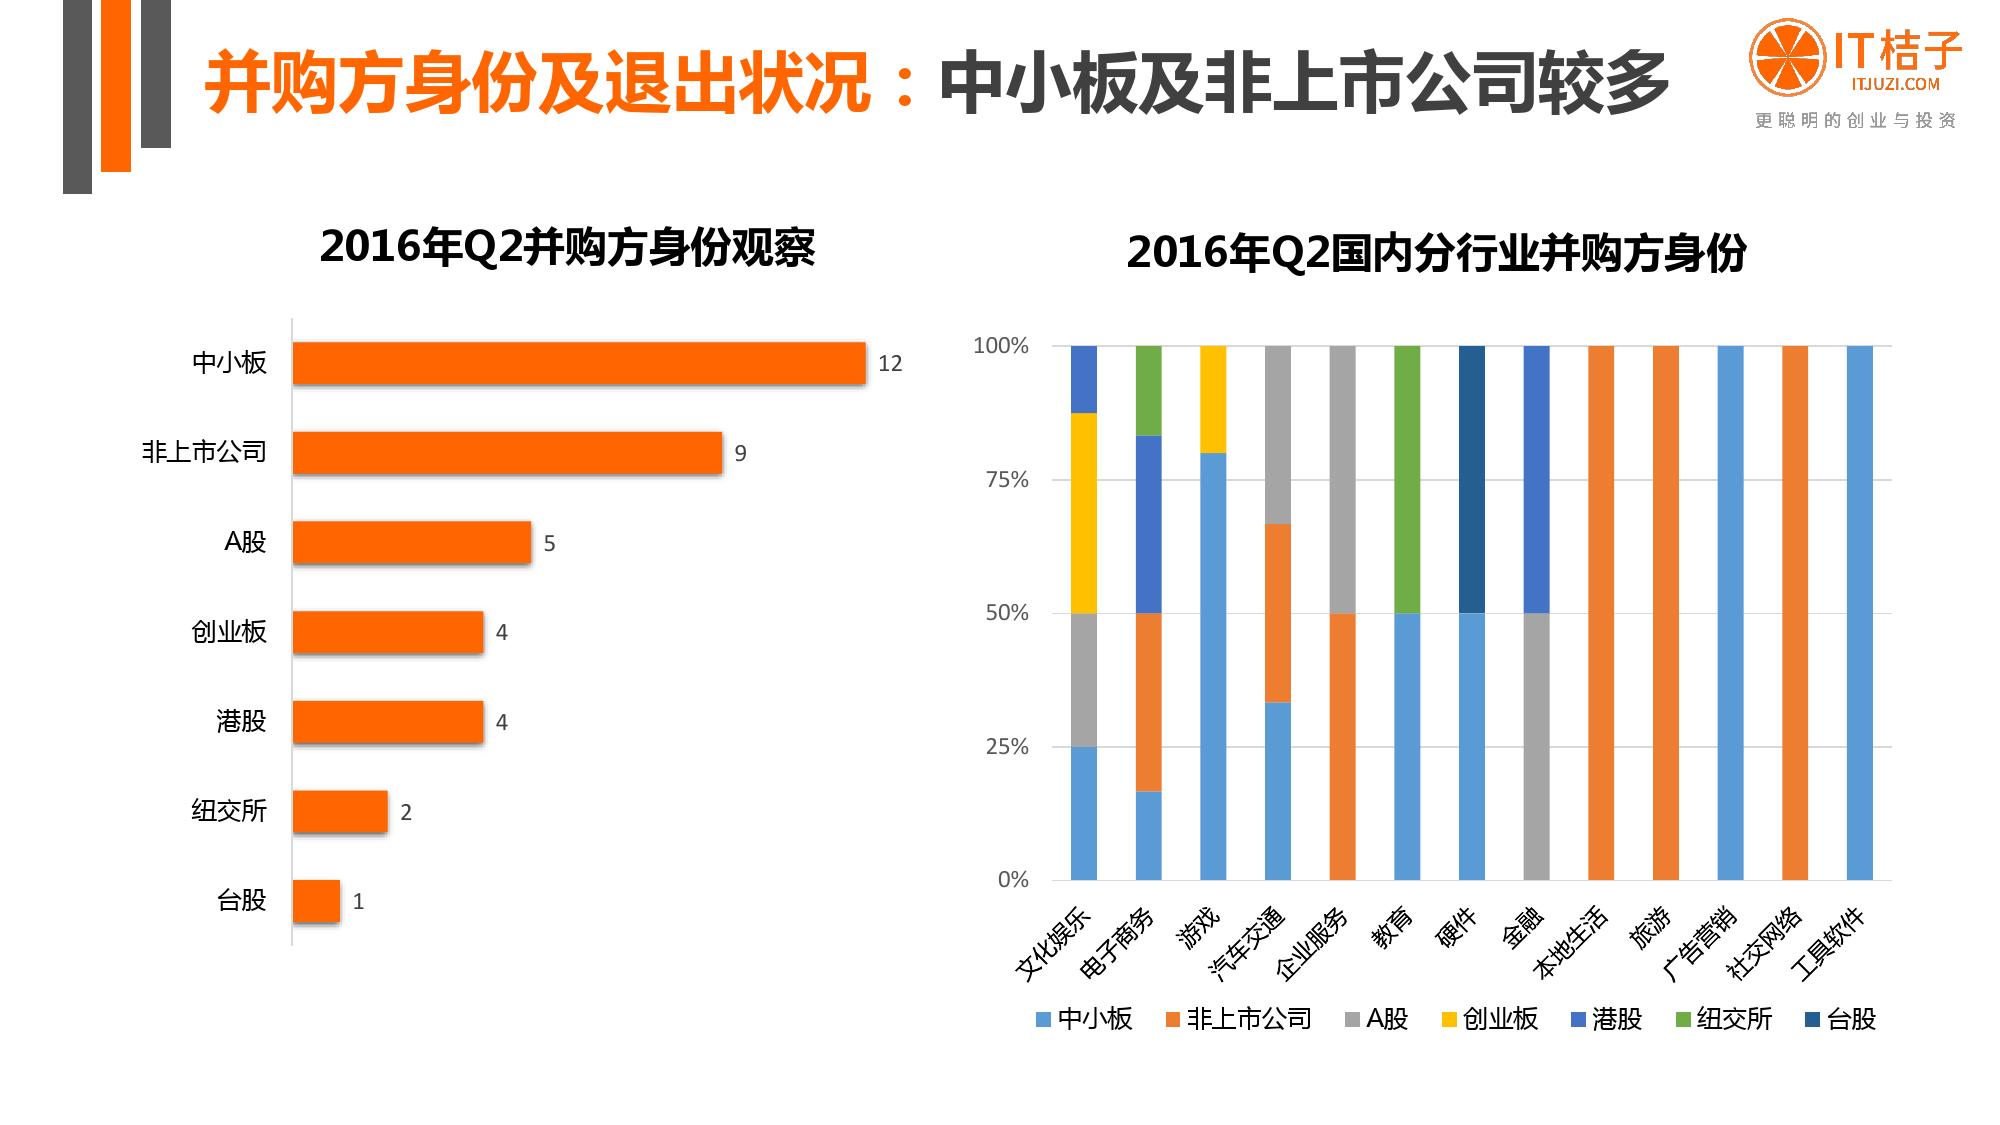 【IT桔子】2016年Q2中国互联网创业投资分析报告_000023